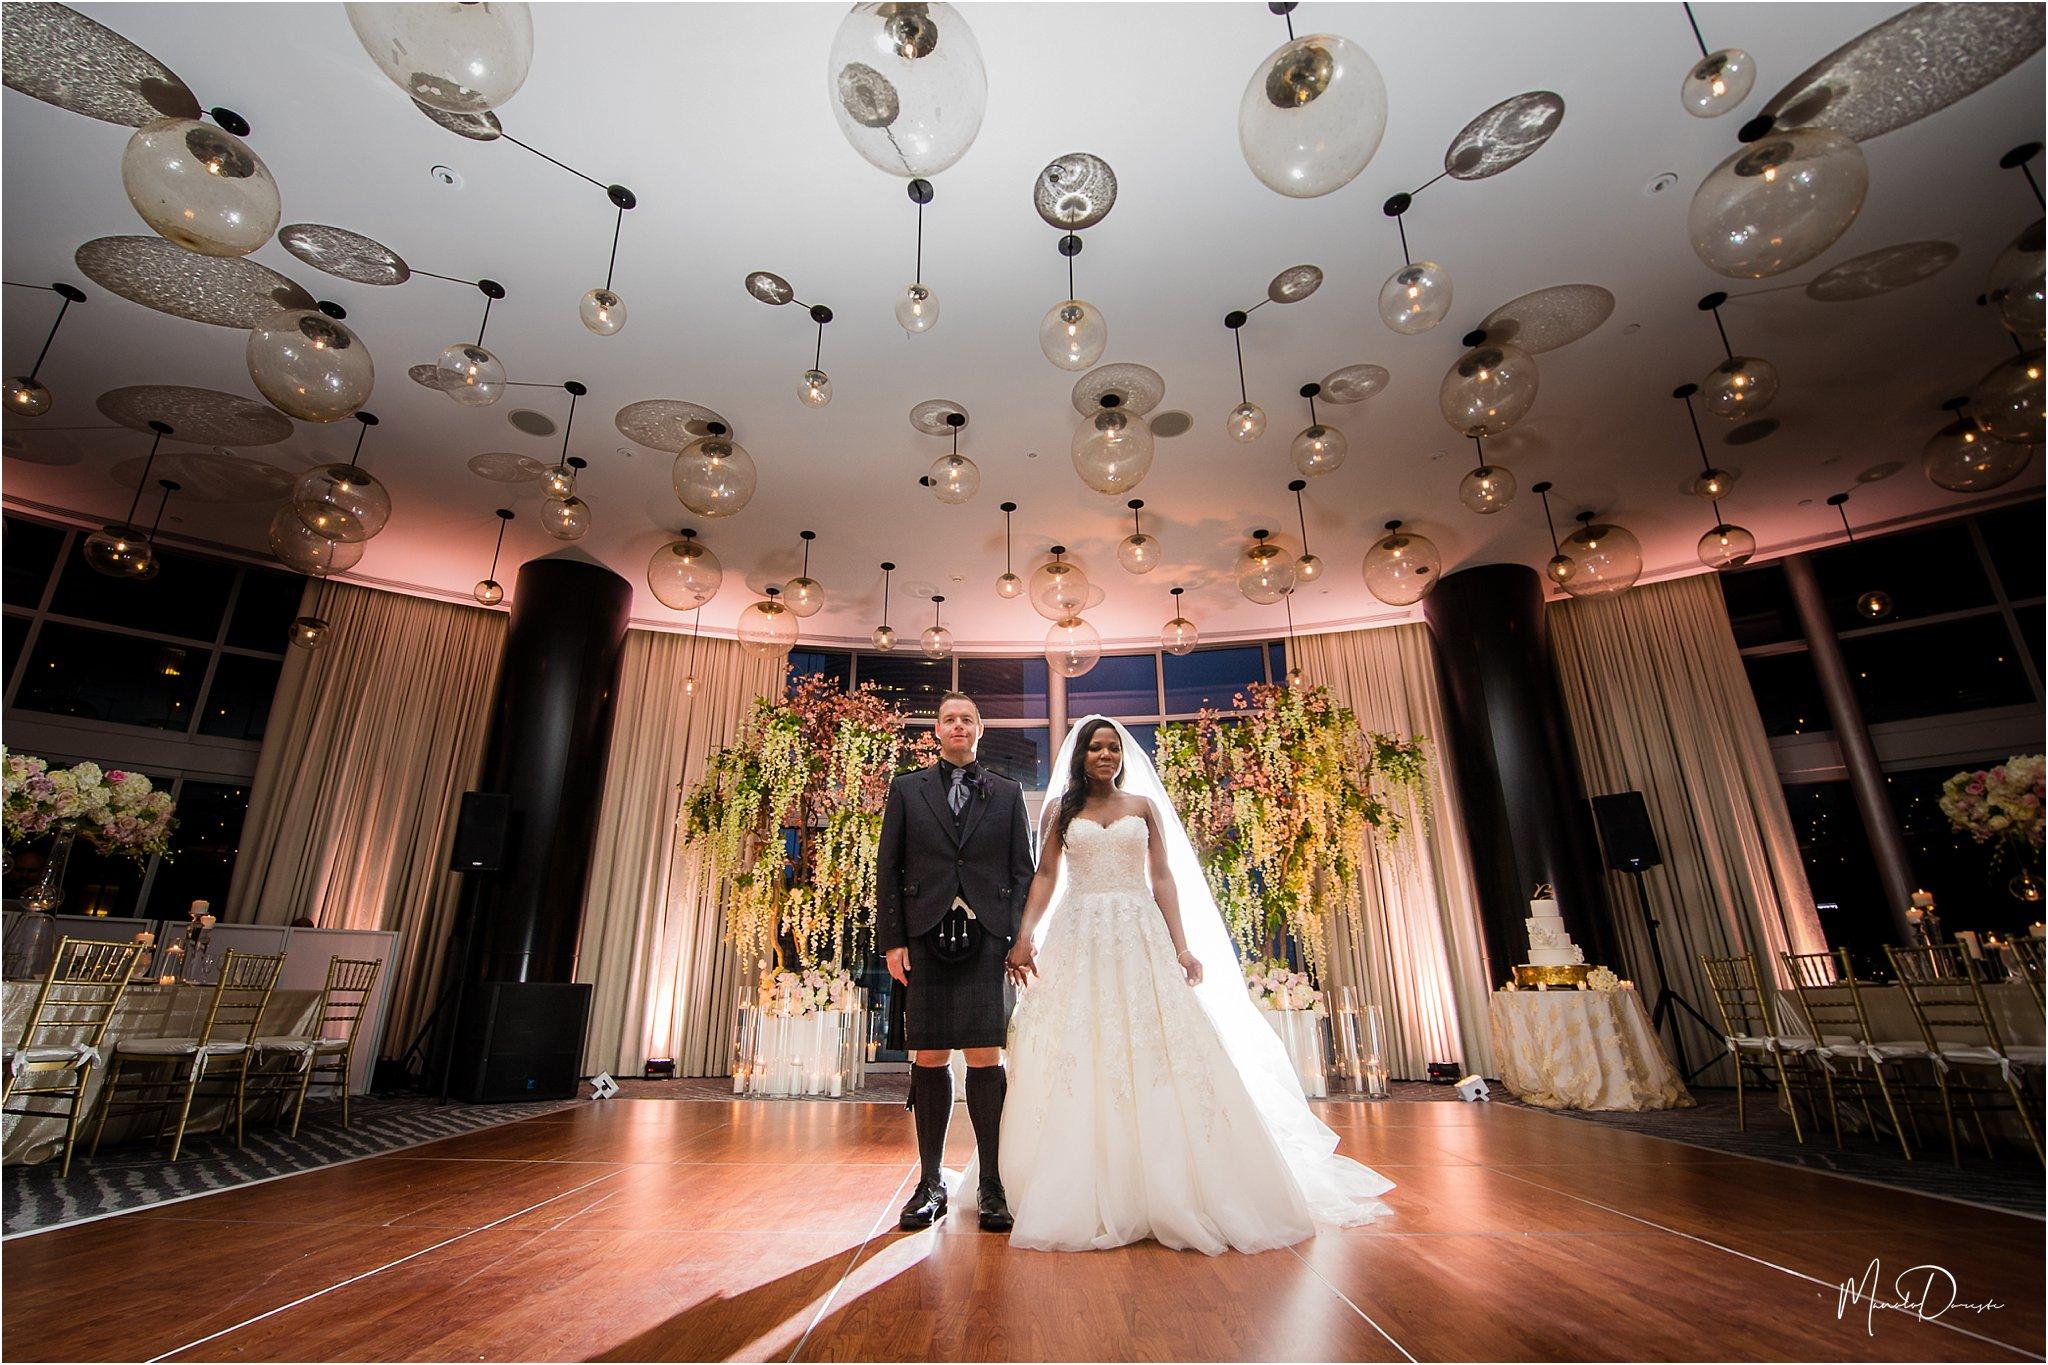 0127_ManoloDoreste_InFocusStudios_Wedding_Family_Photography_Miami_MiamiPhotographer.jpg